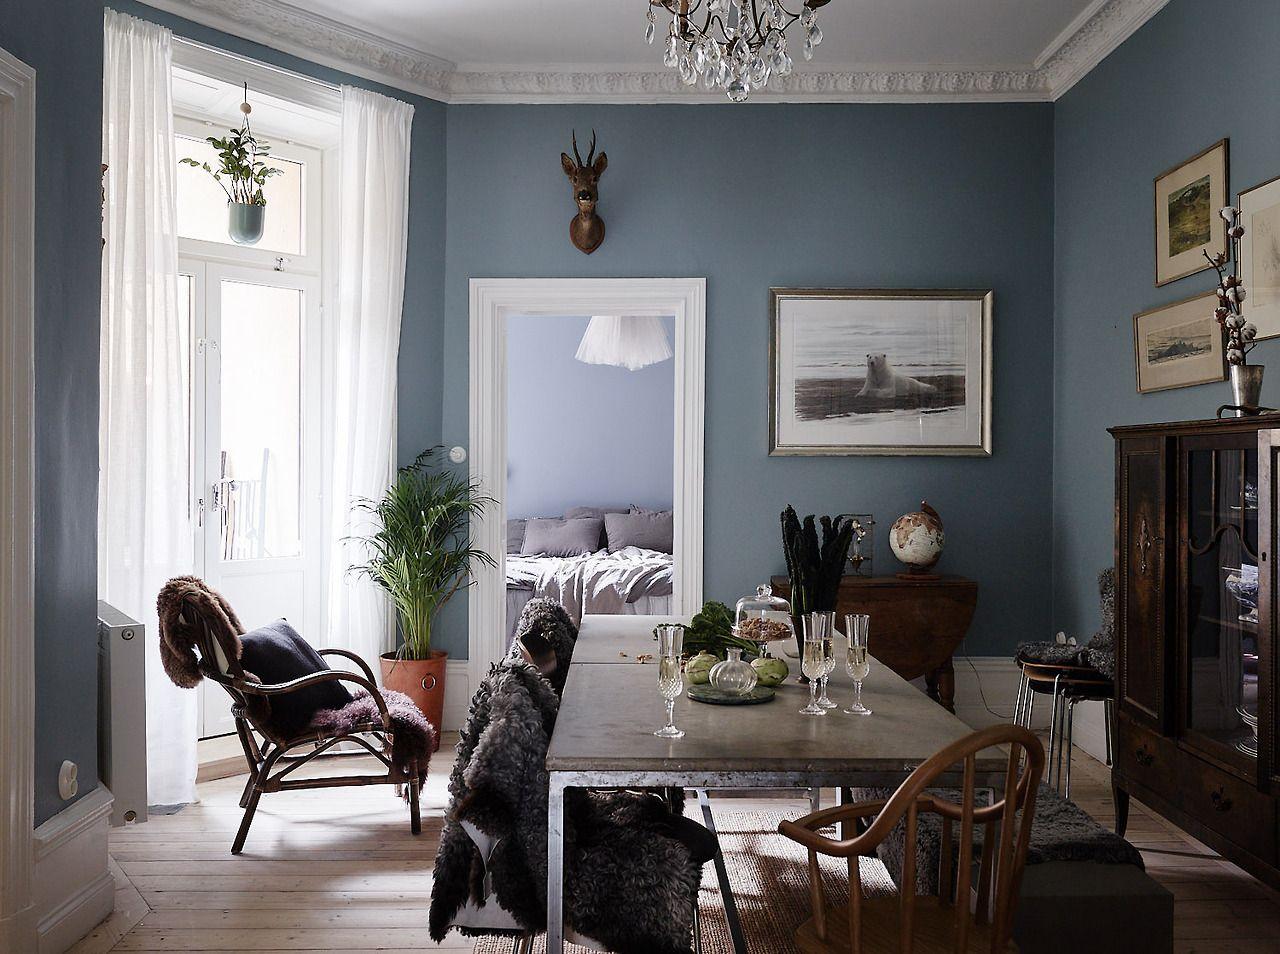 raum•room - Interior Design Inspiration | home | Pinterest | Room ...